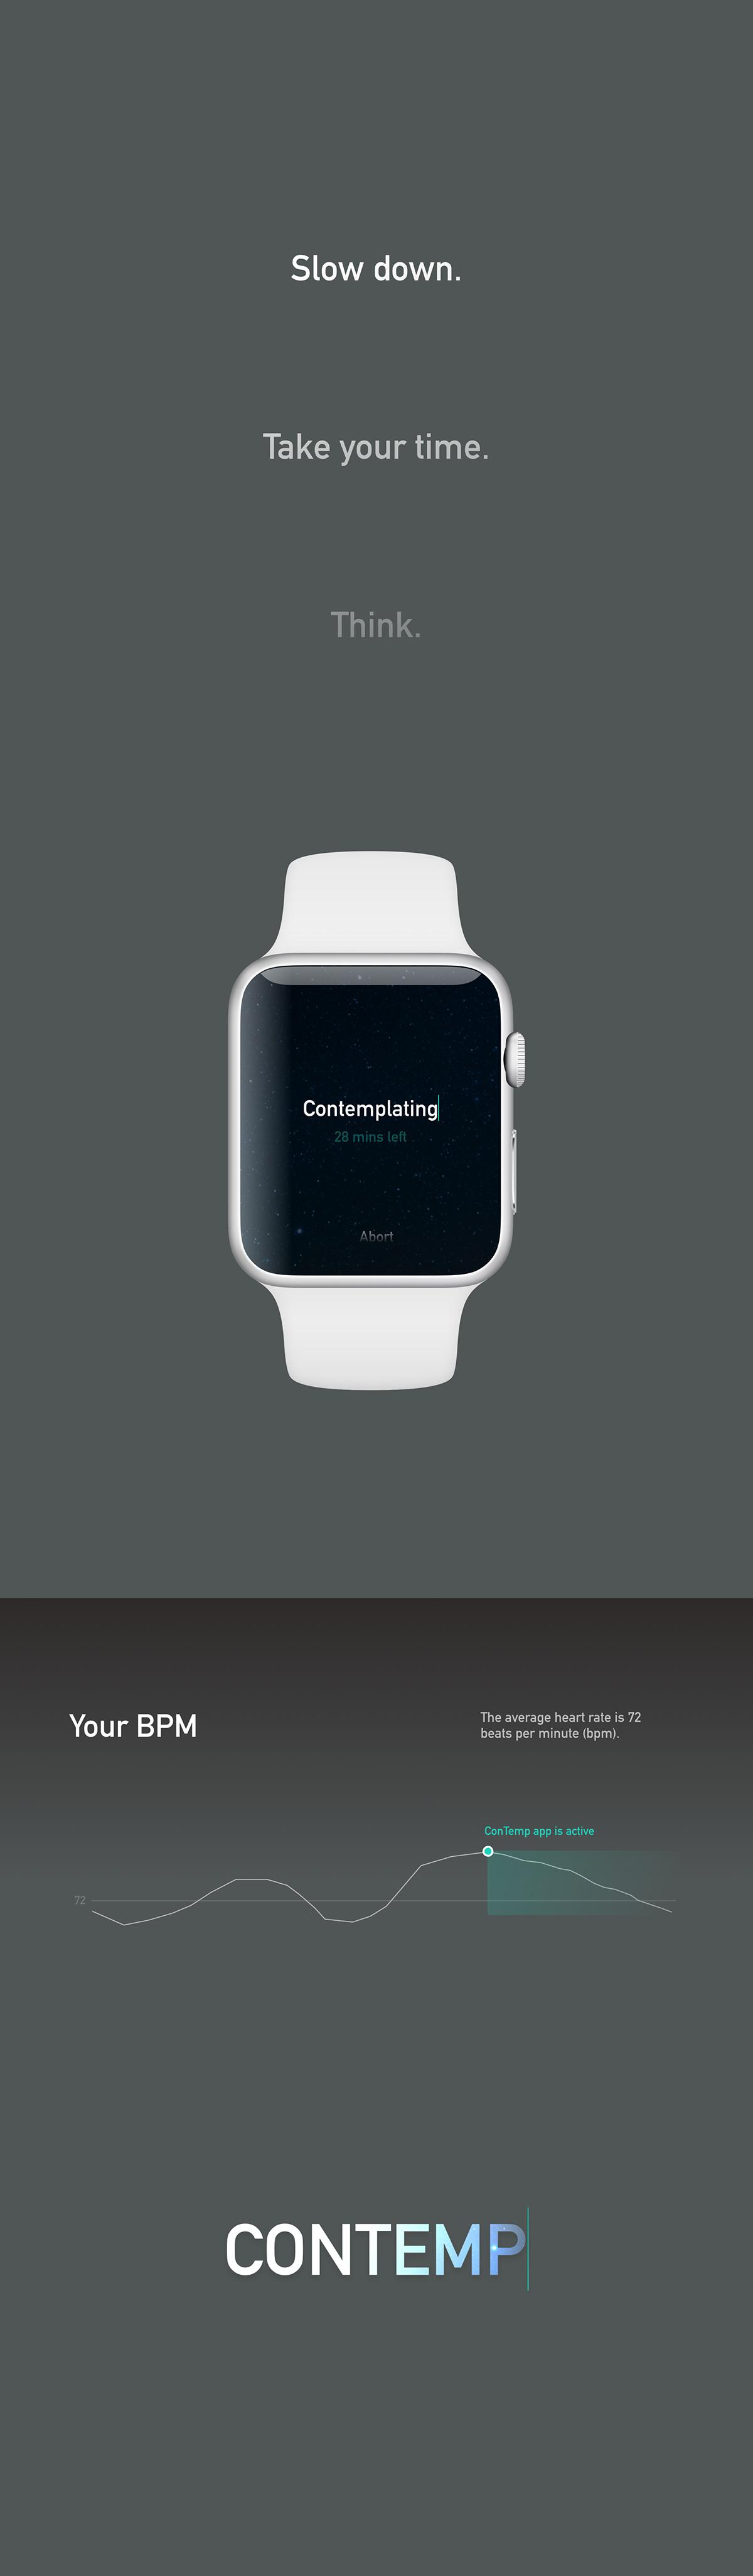 apple watch smart watch ios concept